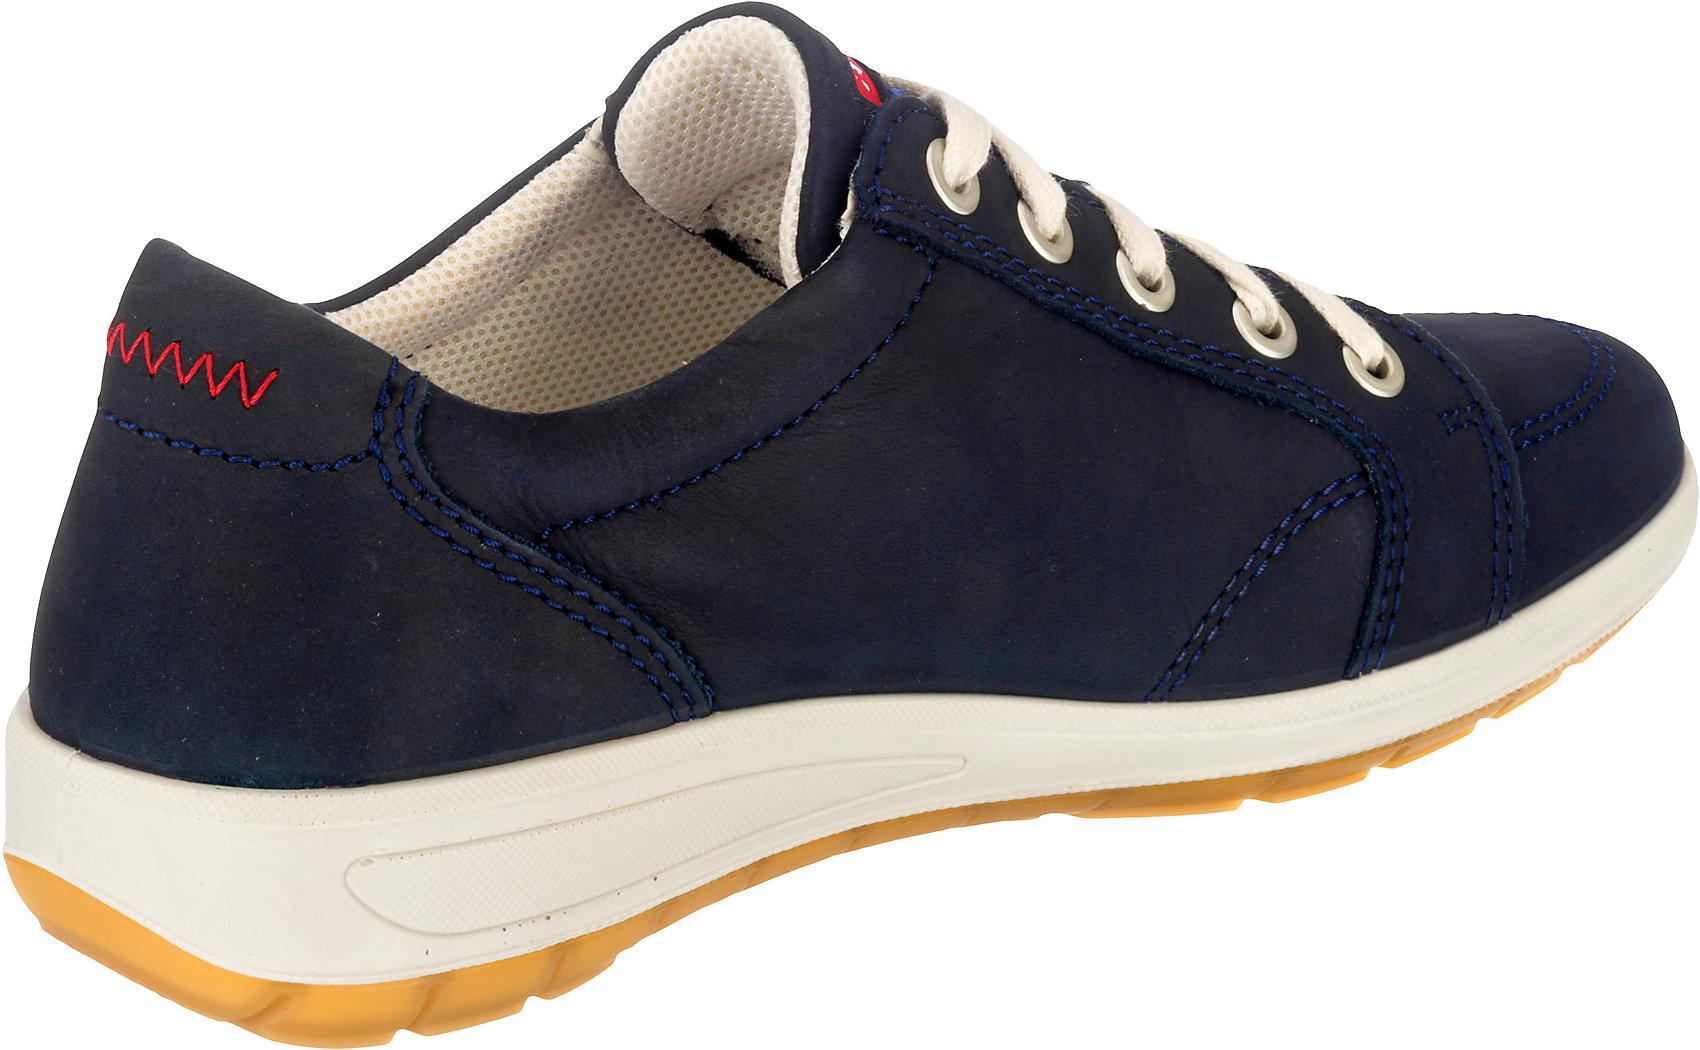 Ara 5751772 Damen Sneakers Tokio Blau Neu Für Low oerdEQxWBC